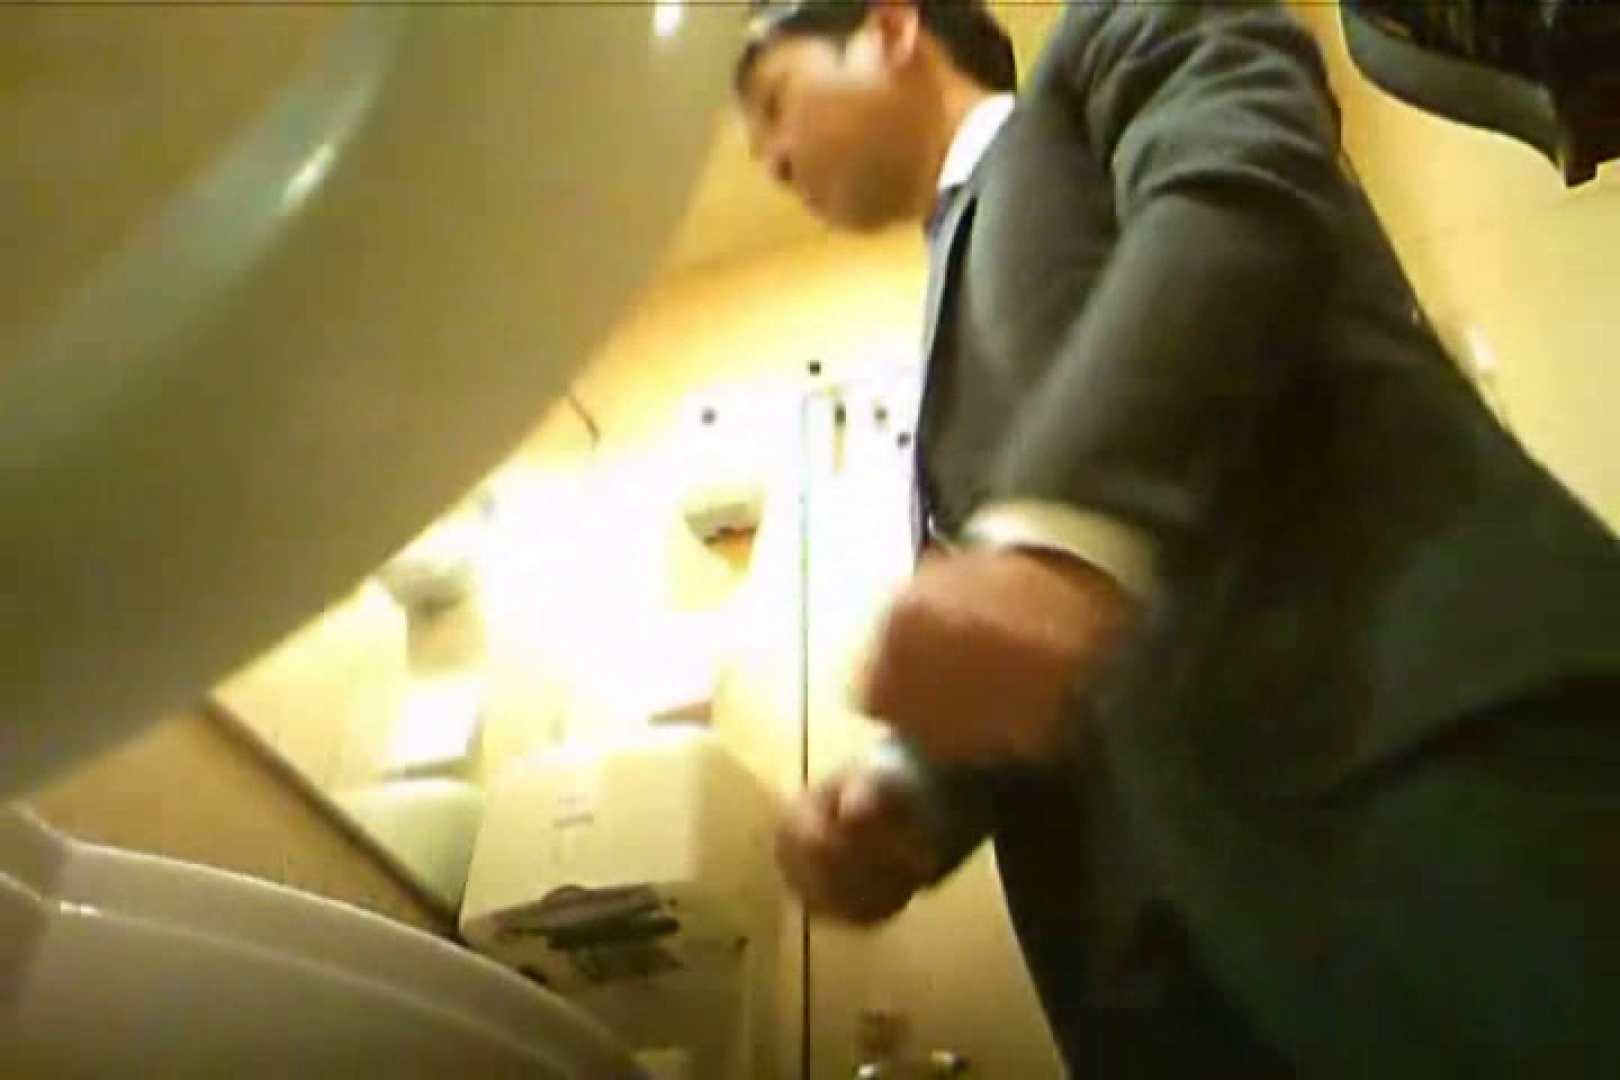 SEASON 2ND!掴み取りさんの洗面所覗き!in新幹線!VOL.06 ノンケ | 覗きお宝  74連発 21